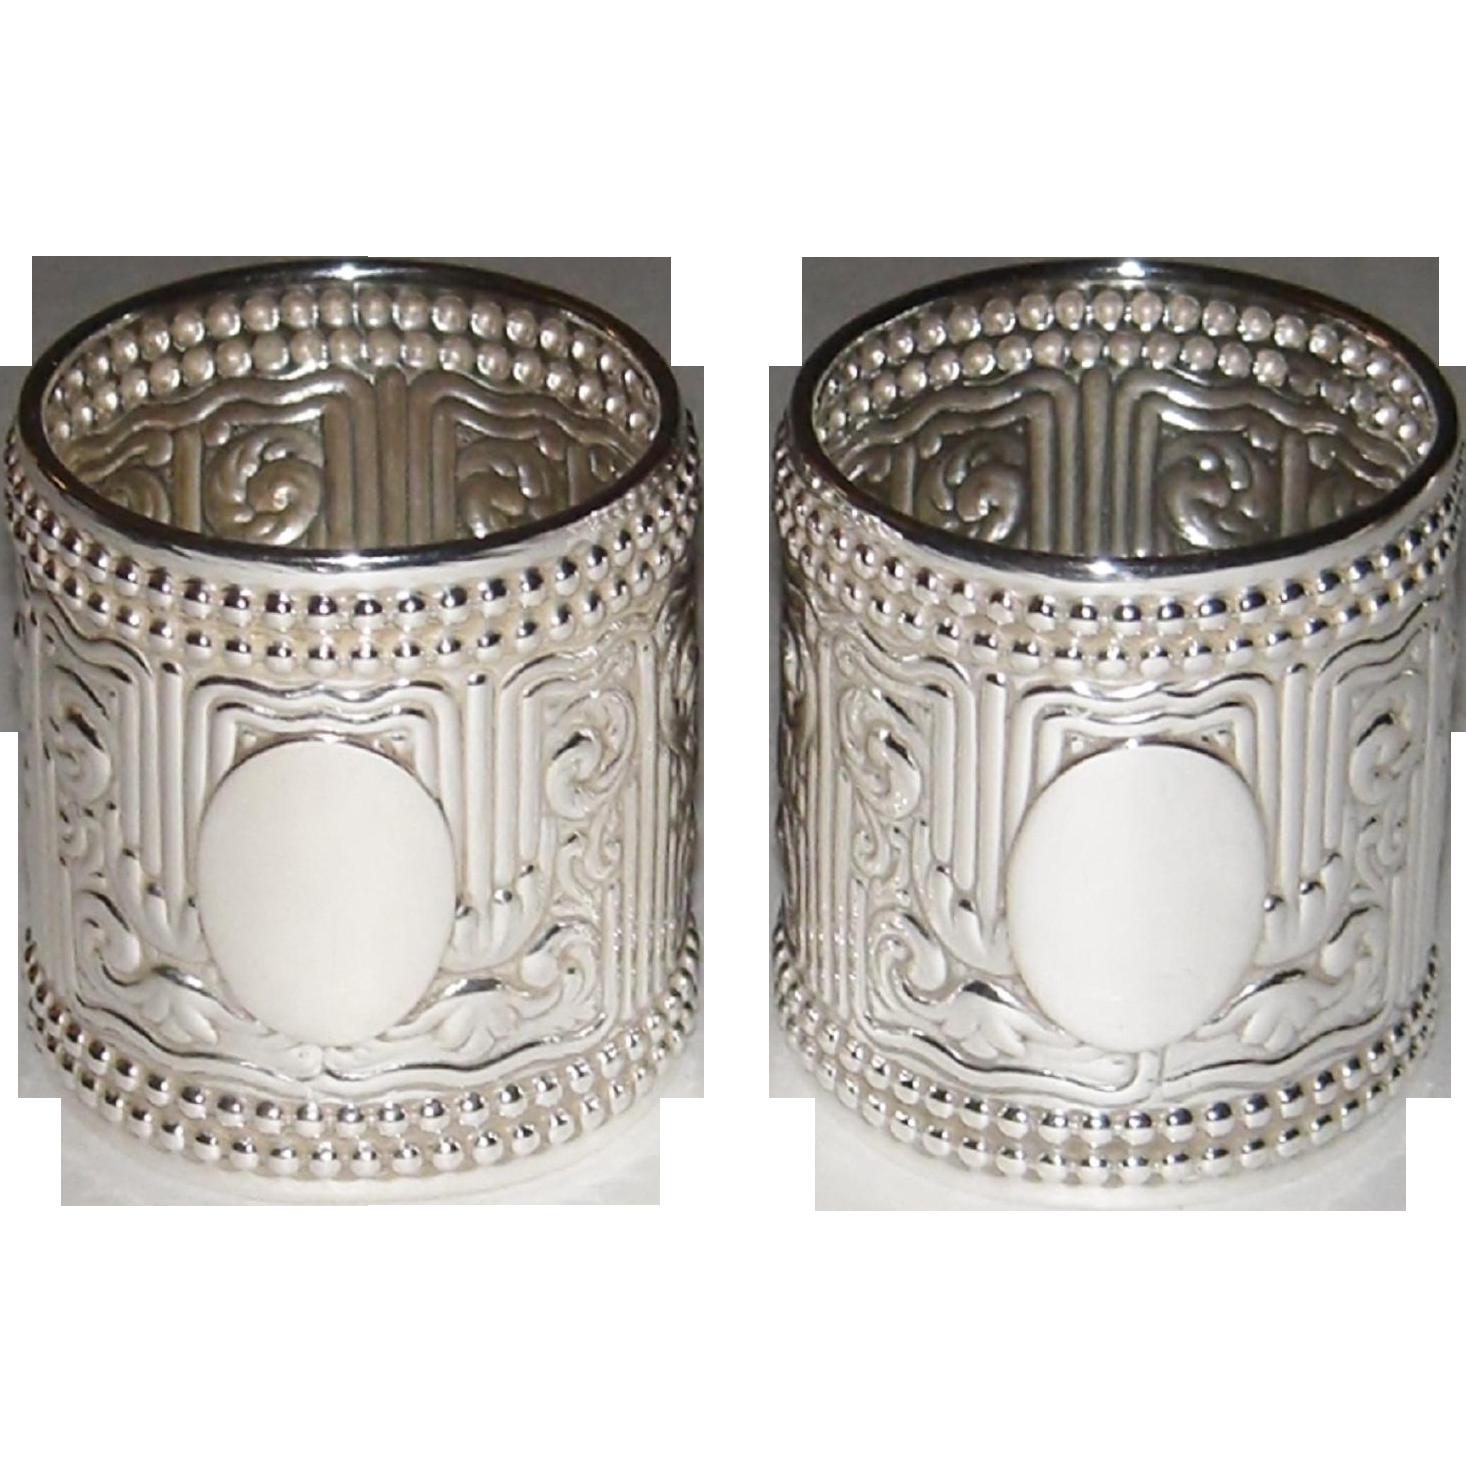 Antique Porcelain Napkin Rings